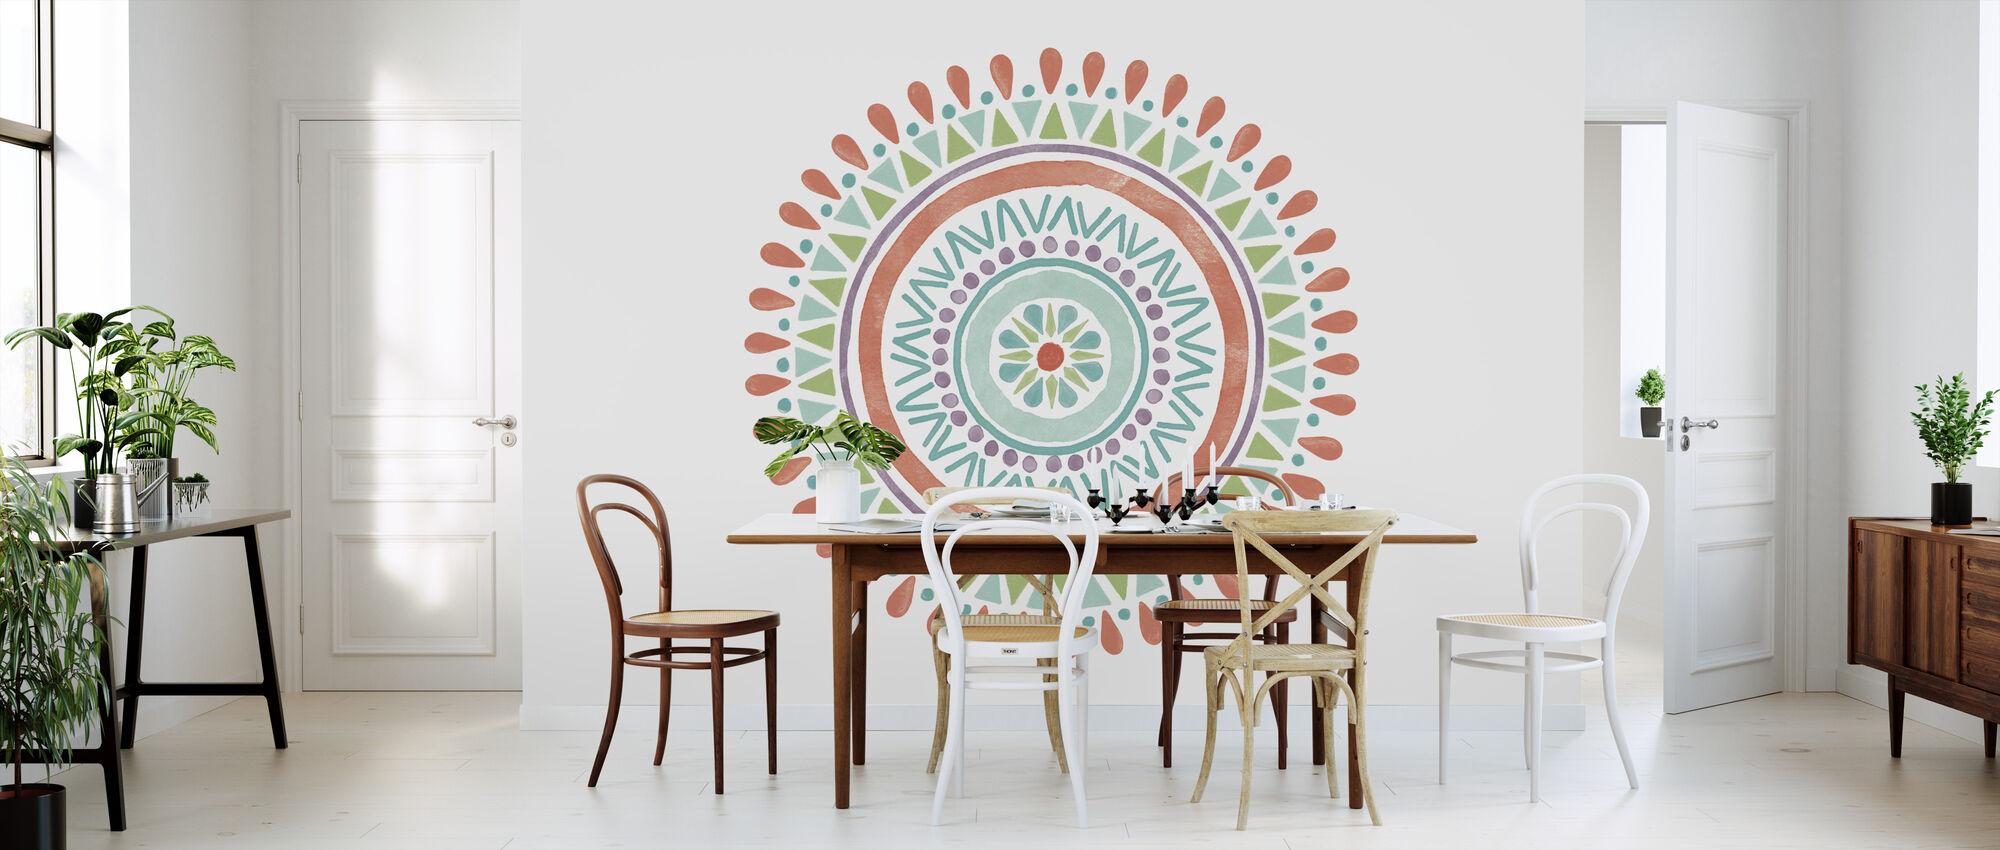 Lovely Llamas Mandala II - Wallpaper - Kitchen